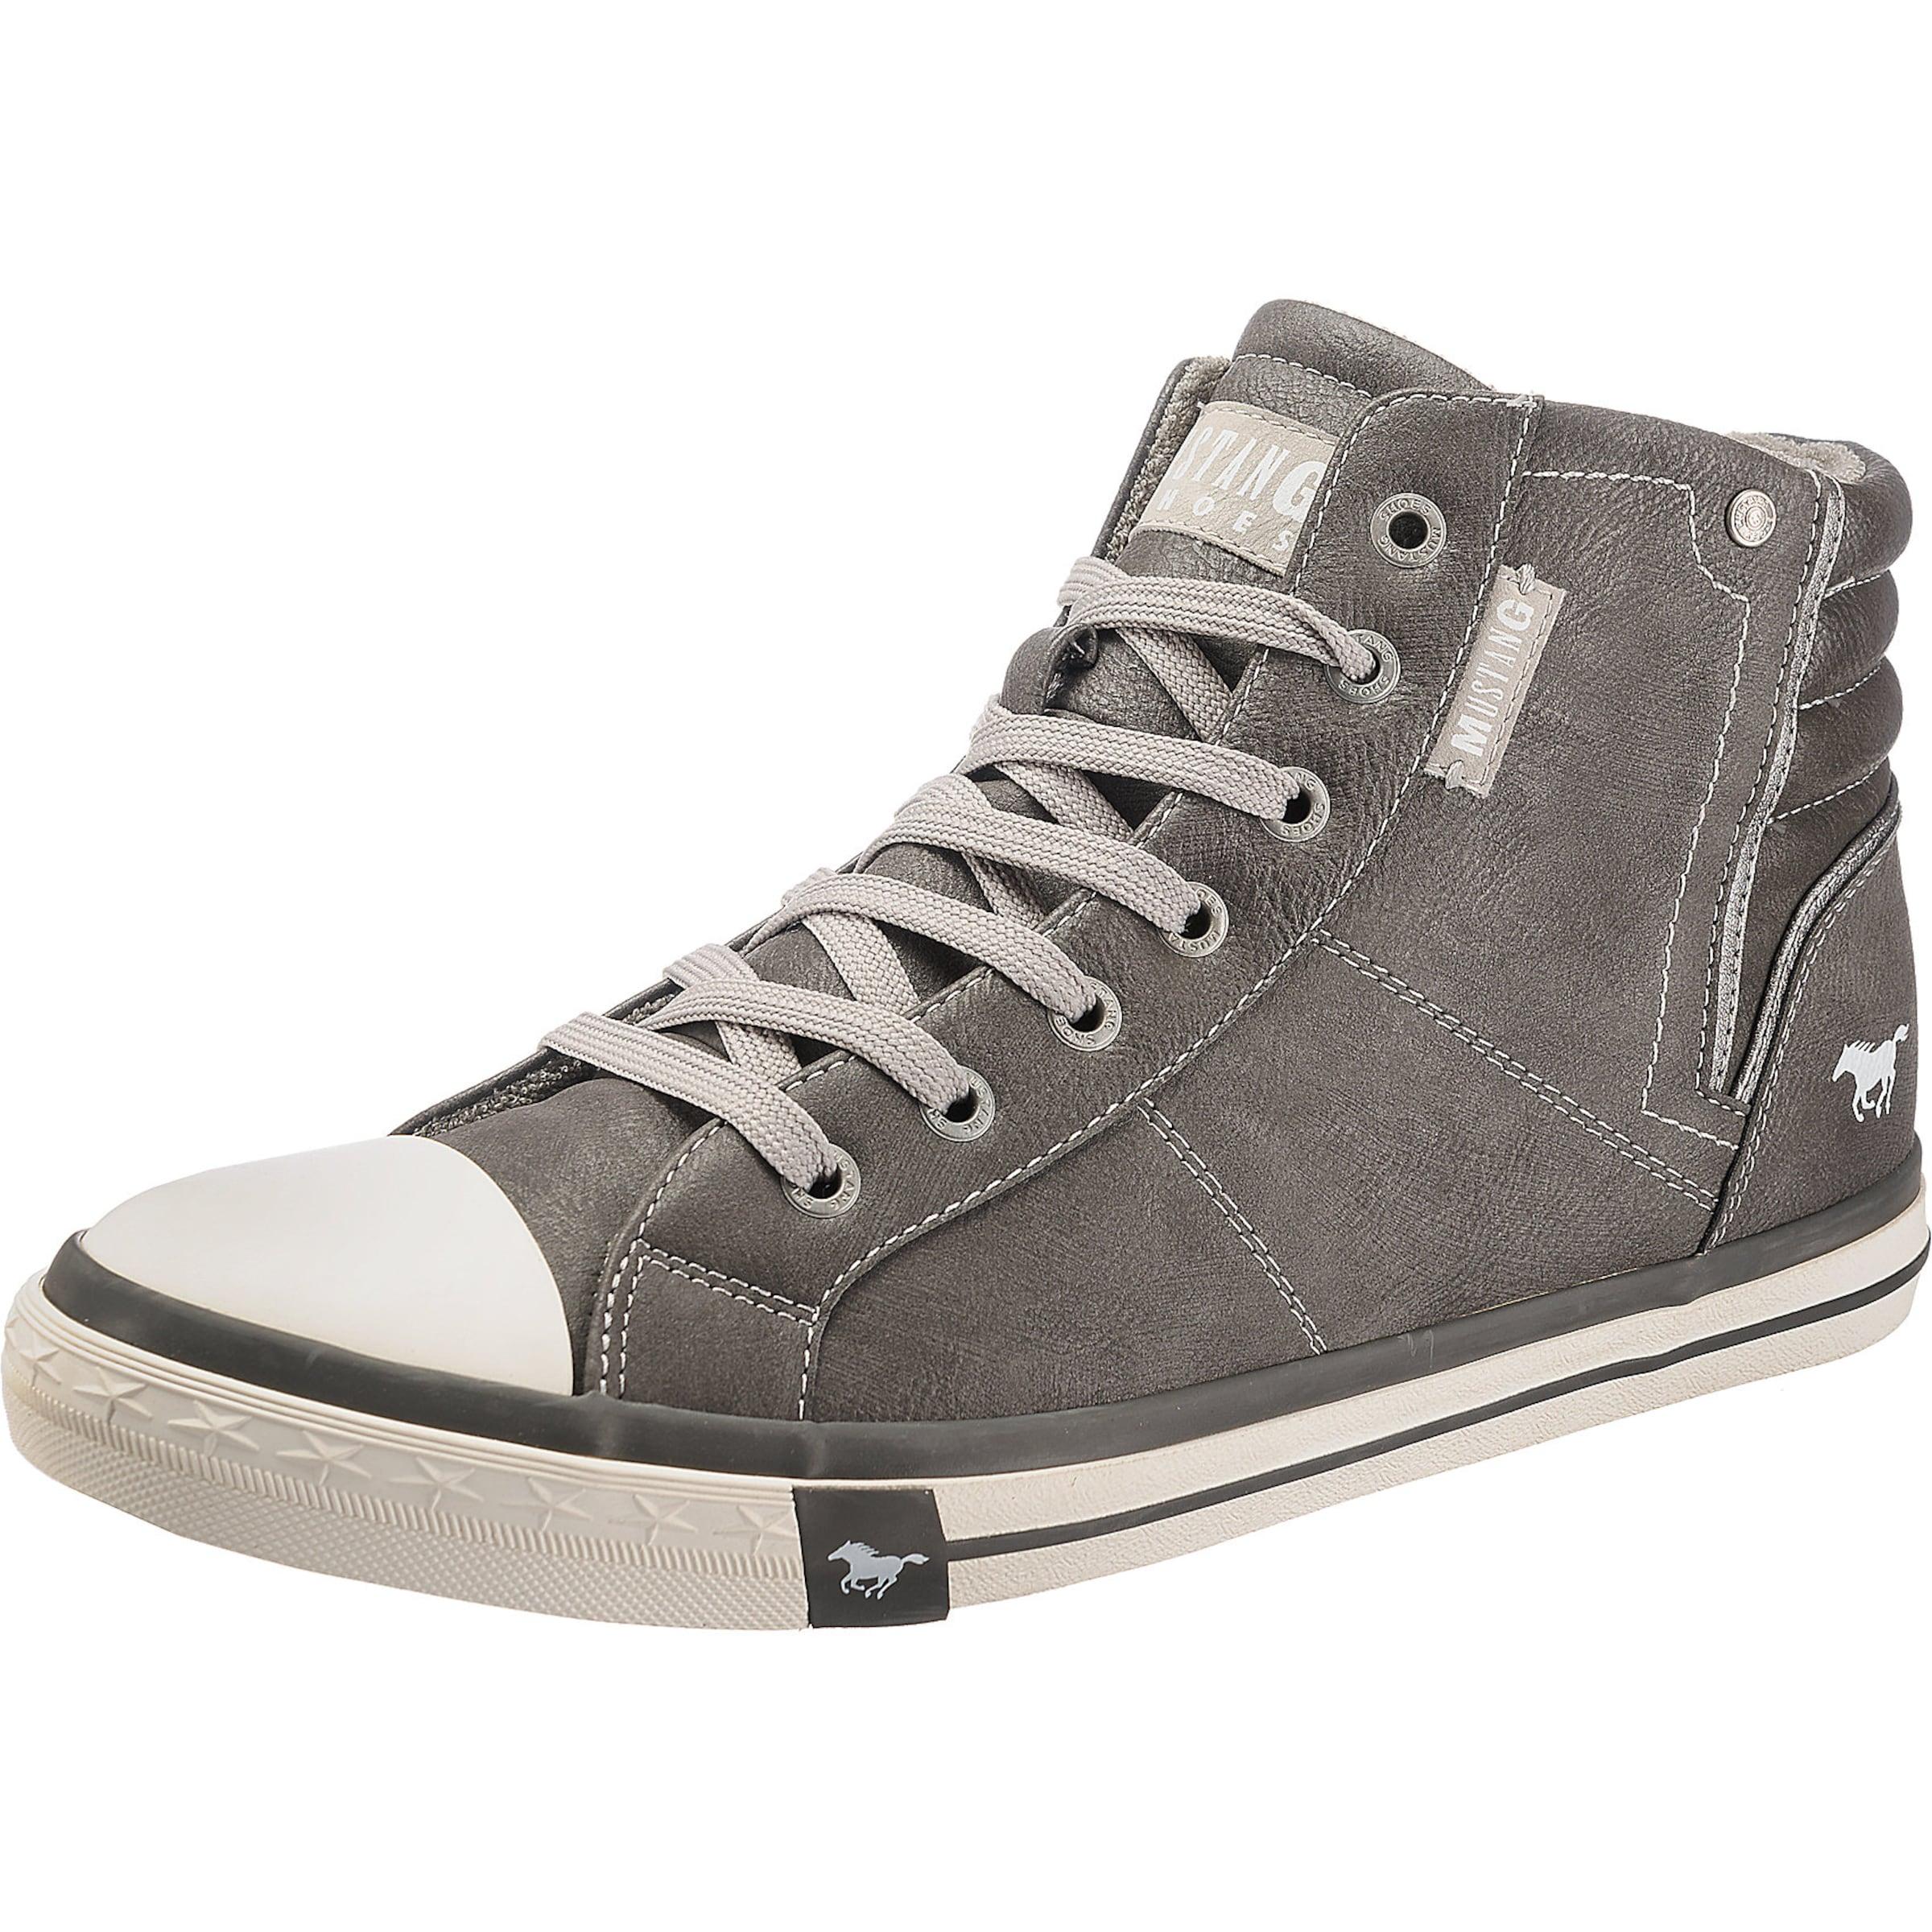 MUSTANG Sneakers Verschleißfeste billige Schuhe Hohe Qualität